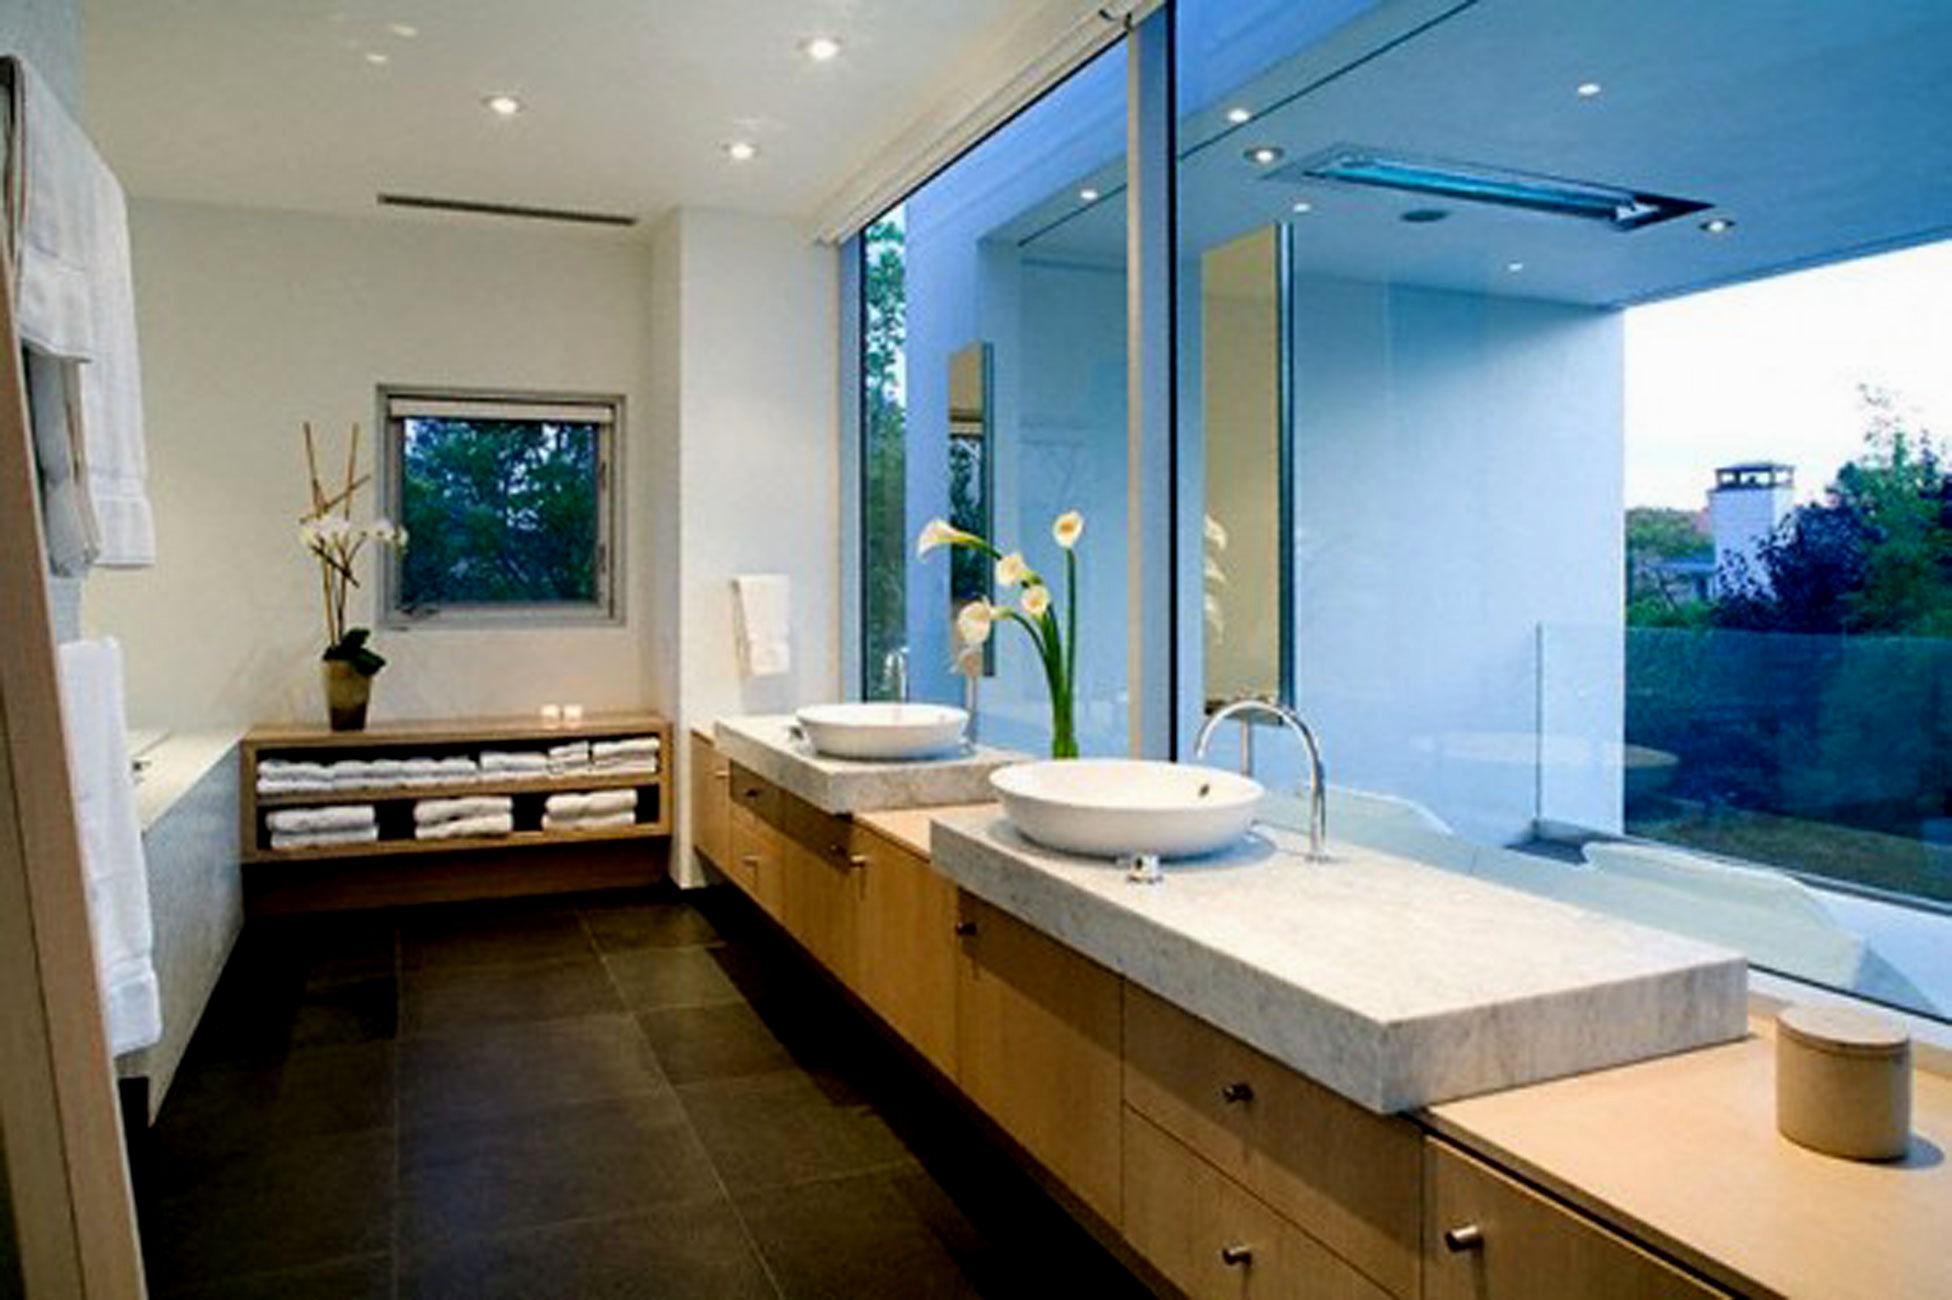 awesome rustic bathroom vanity plans layout-Finest Rustic Bathroom Vanity Plans Décor